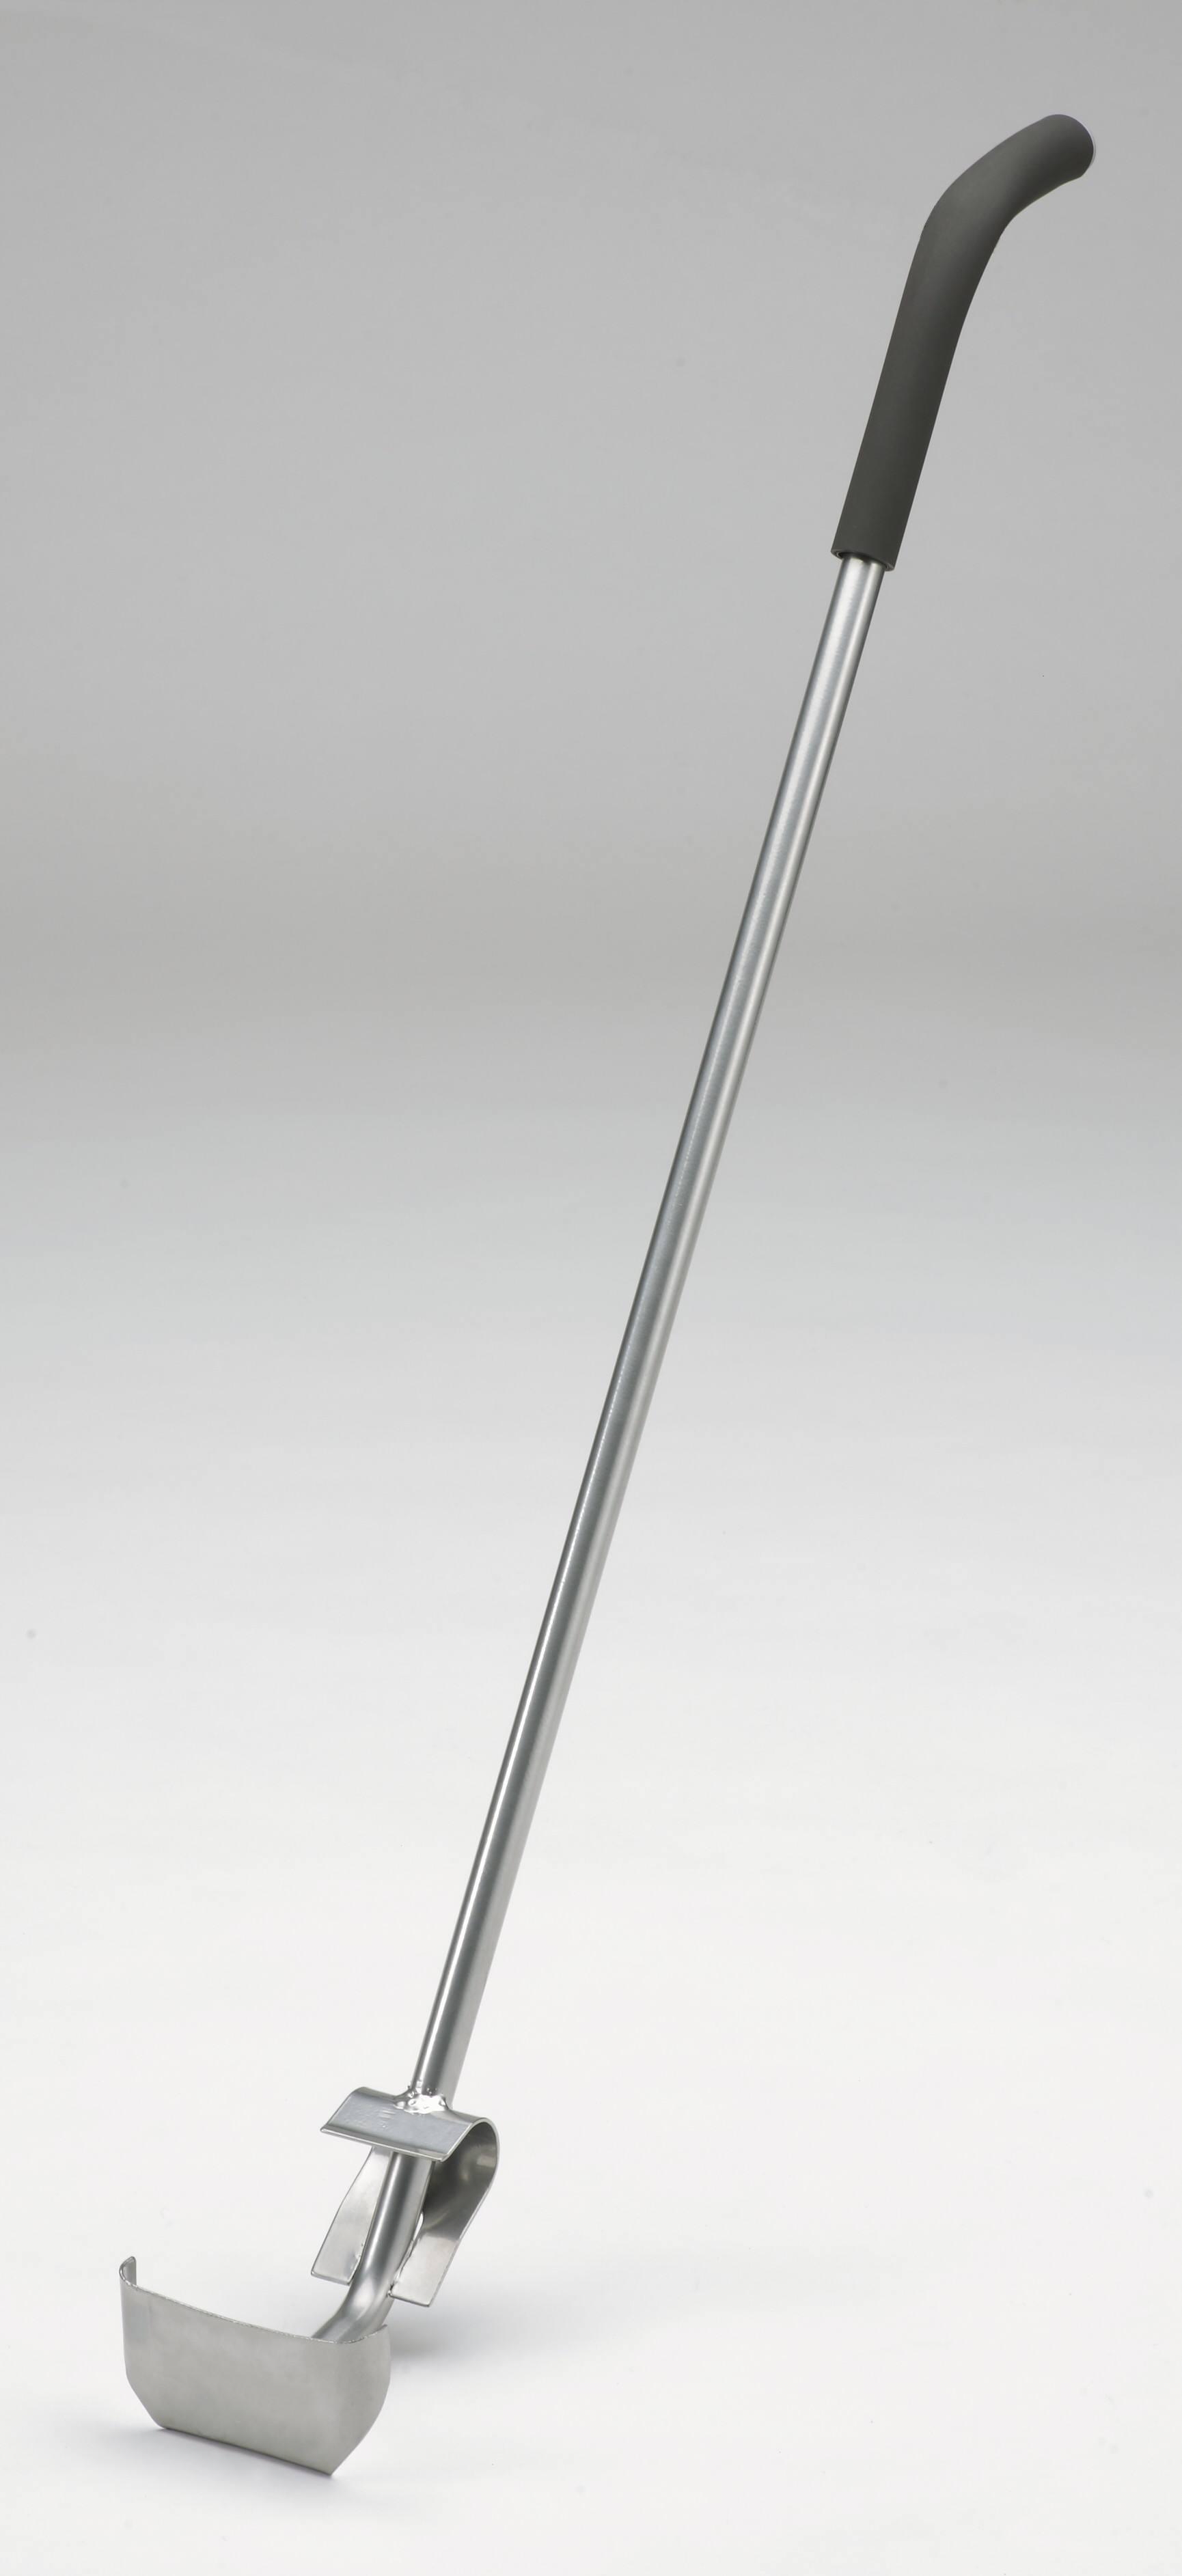 Vodící tyč KHW pro Snow Tiger